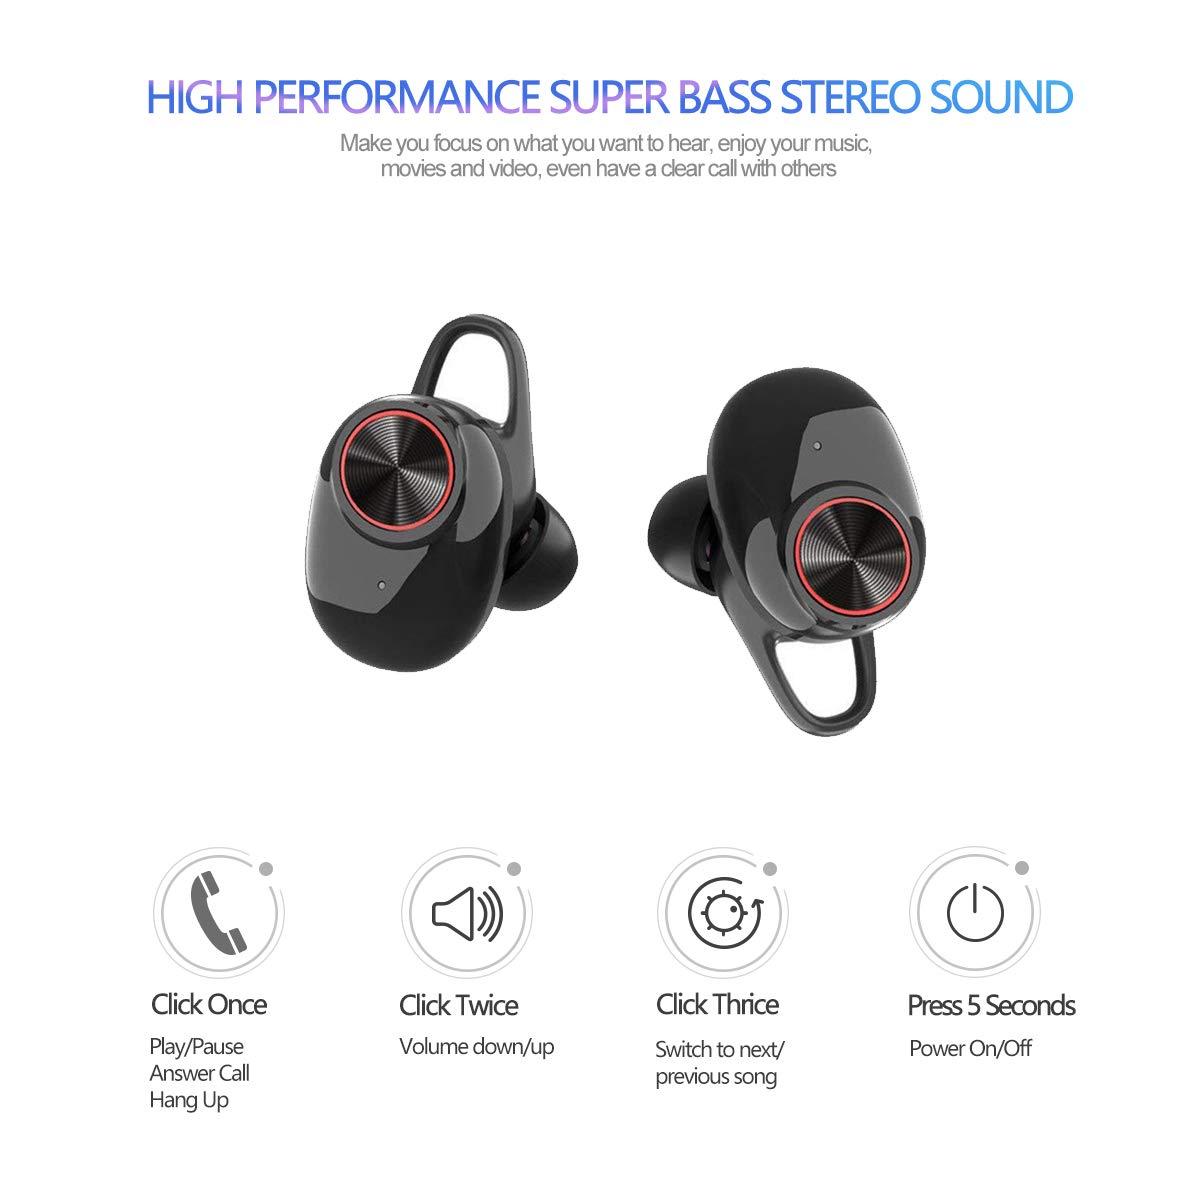 MINLUK Mini Auricular Bluetooth 5.0 Inalambricos Invisible, TWS Auriculares Bluetooth Manos Libres Deportivo IPX5 Estéreo y Cancelación de Ruido, ...